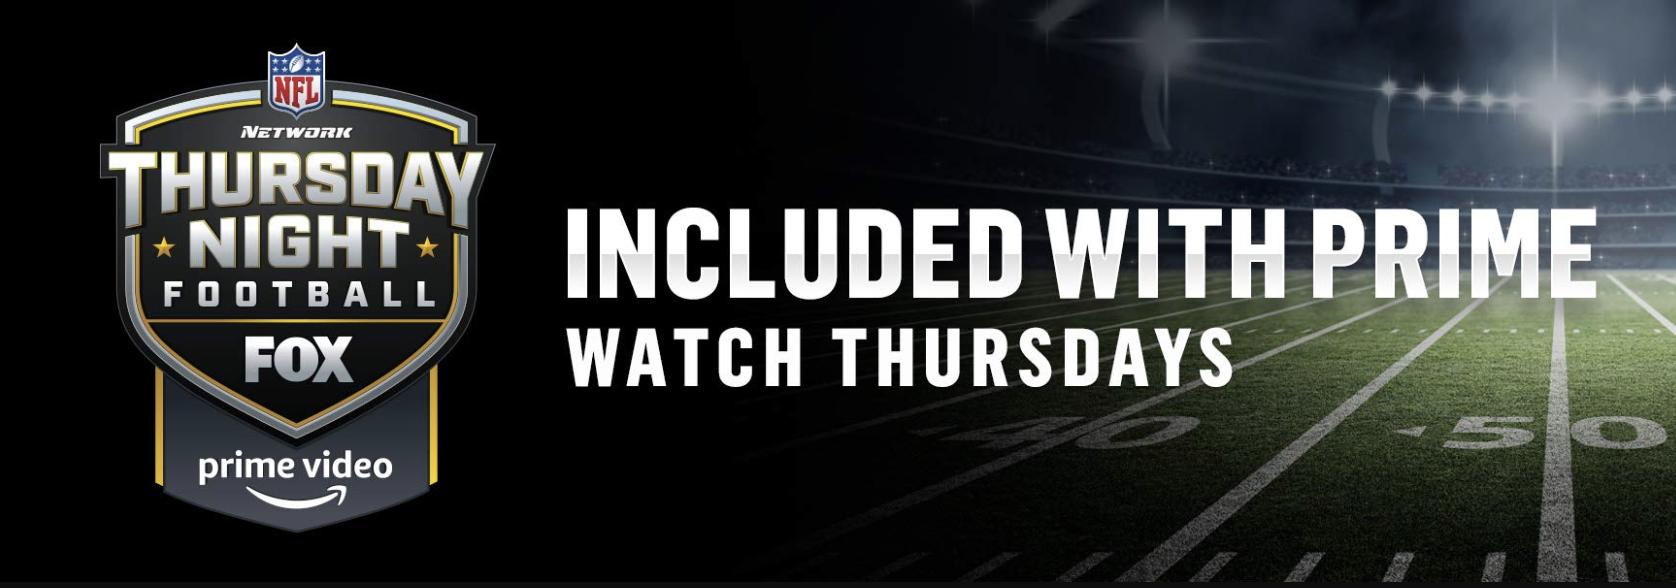 Starting Tonight Watch Thursday Night Football For Free On Amazon Thursday Night Football Thursday Football Football